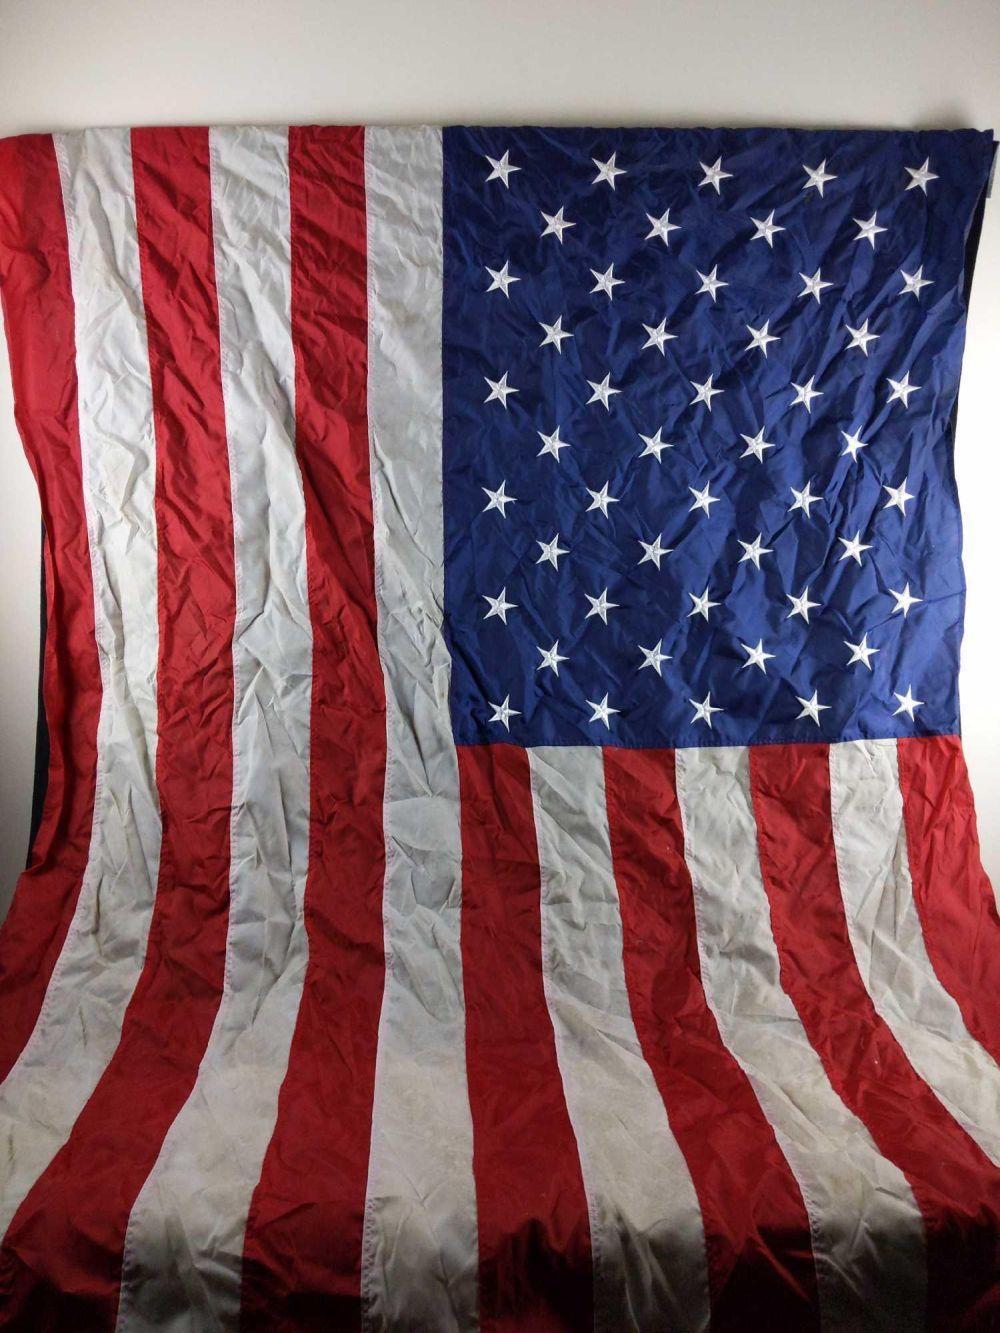 Lot 262: United States of America Nylon Embroideredd Flag